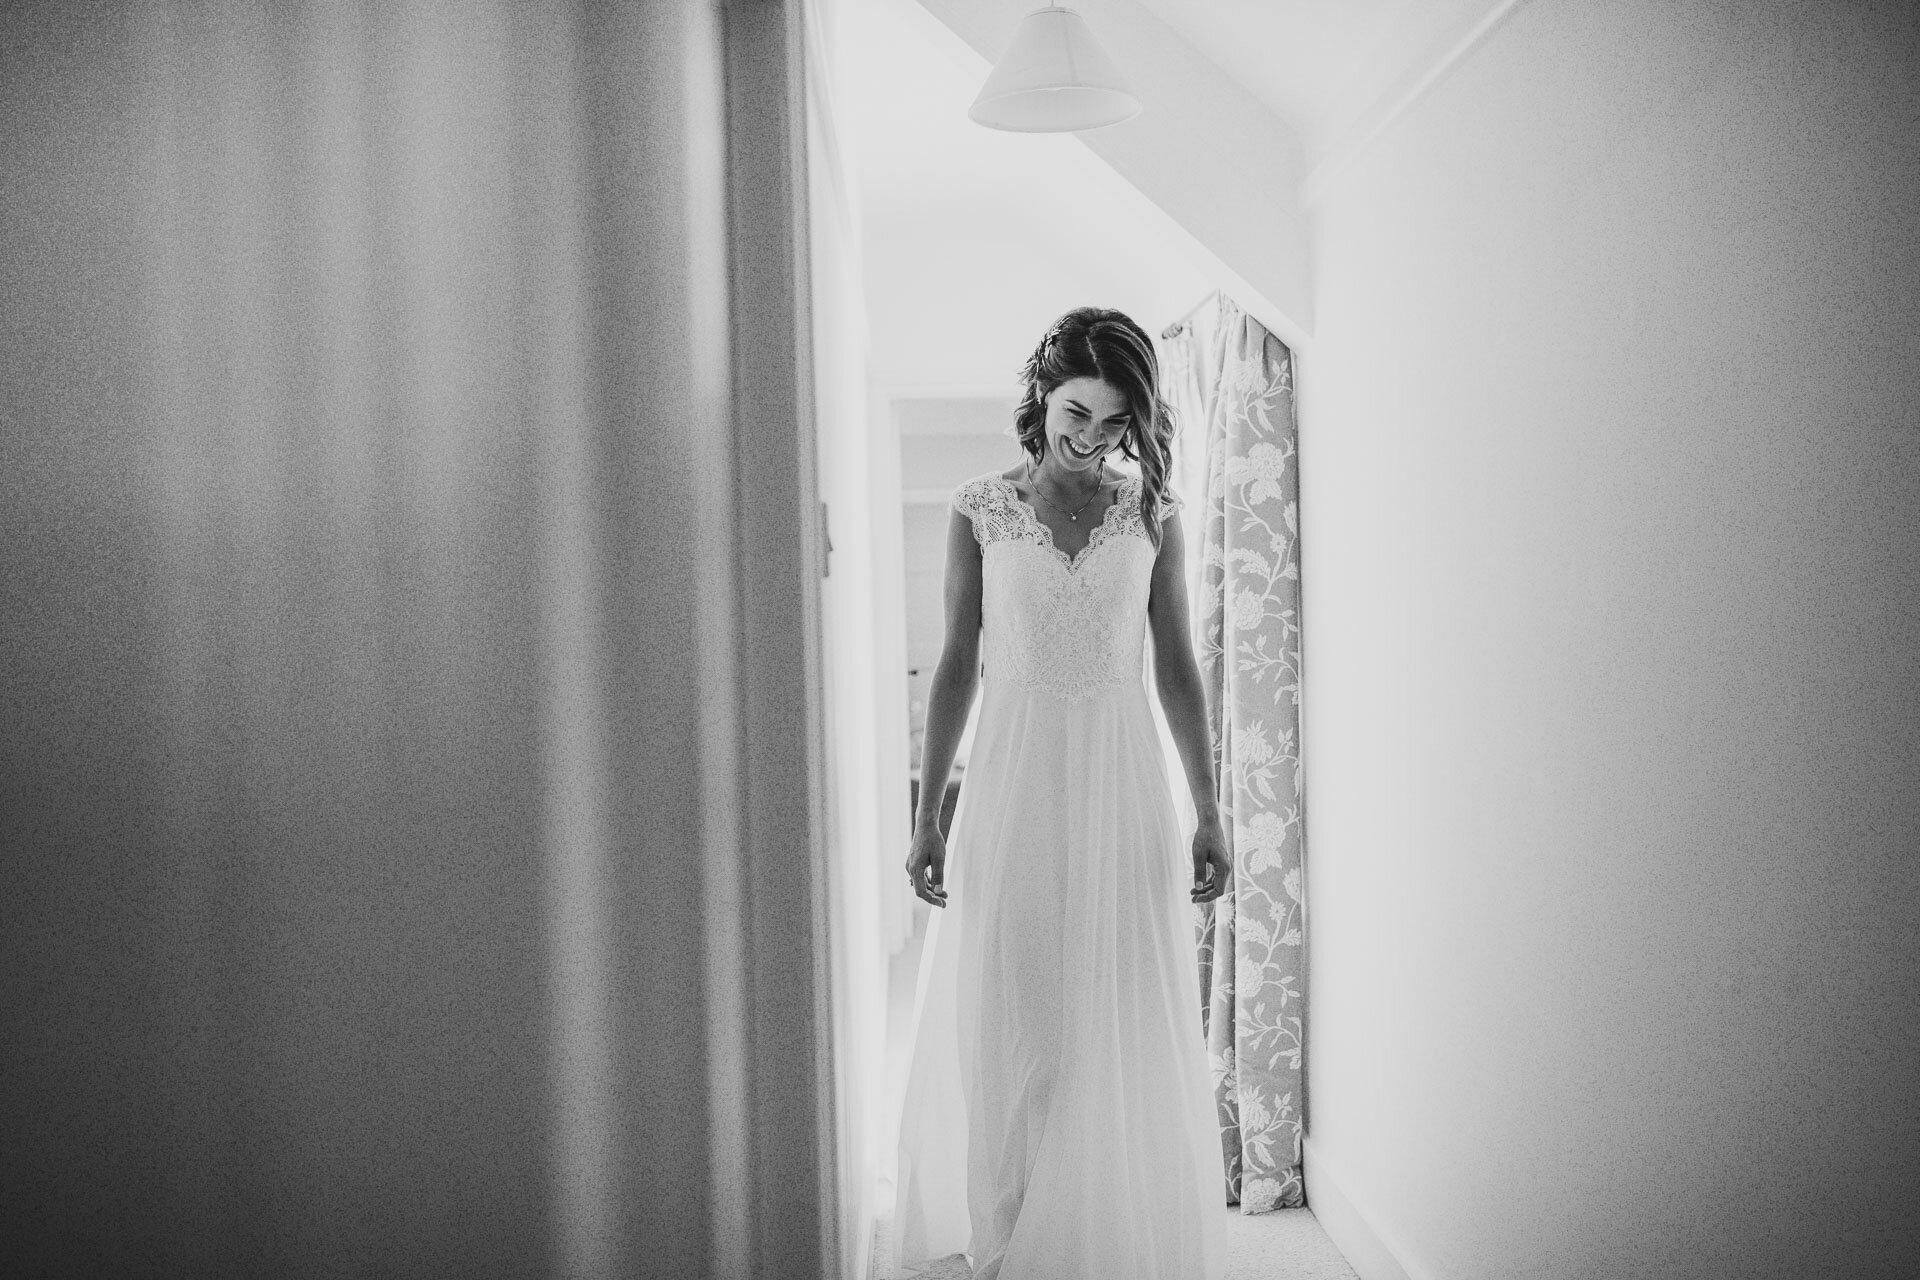 dorset_wedding_photographer-19.jpg